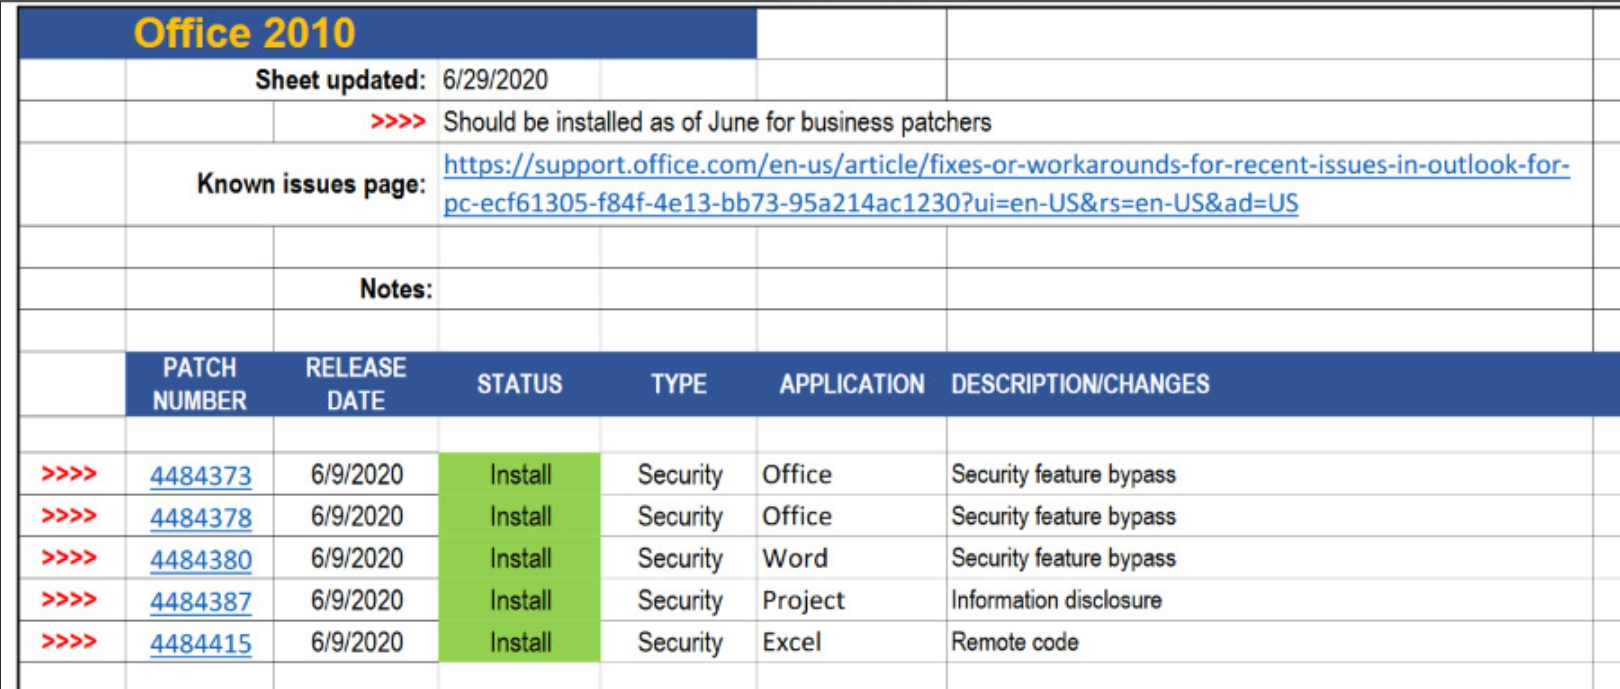 Office-2010-updates-2020-06-30-